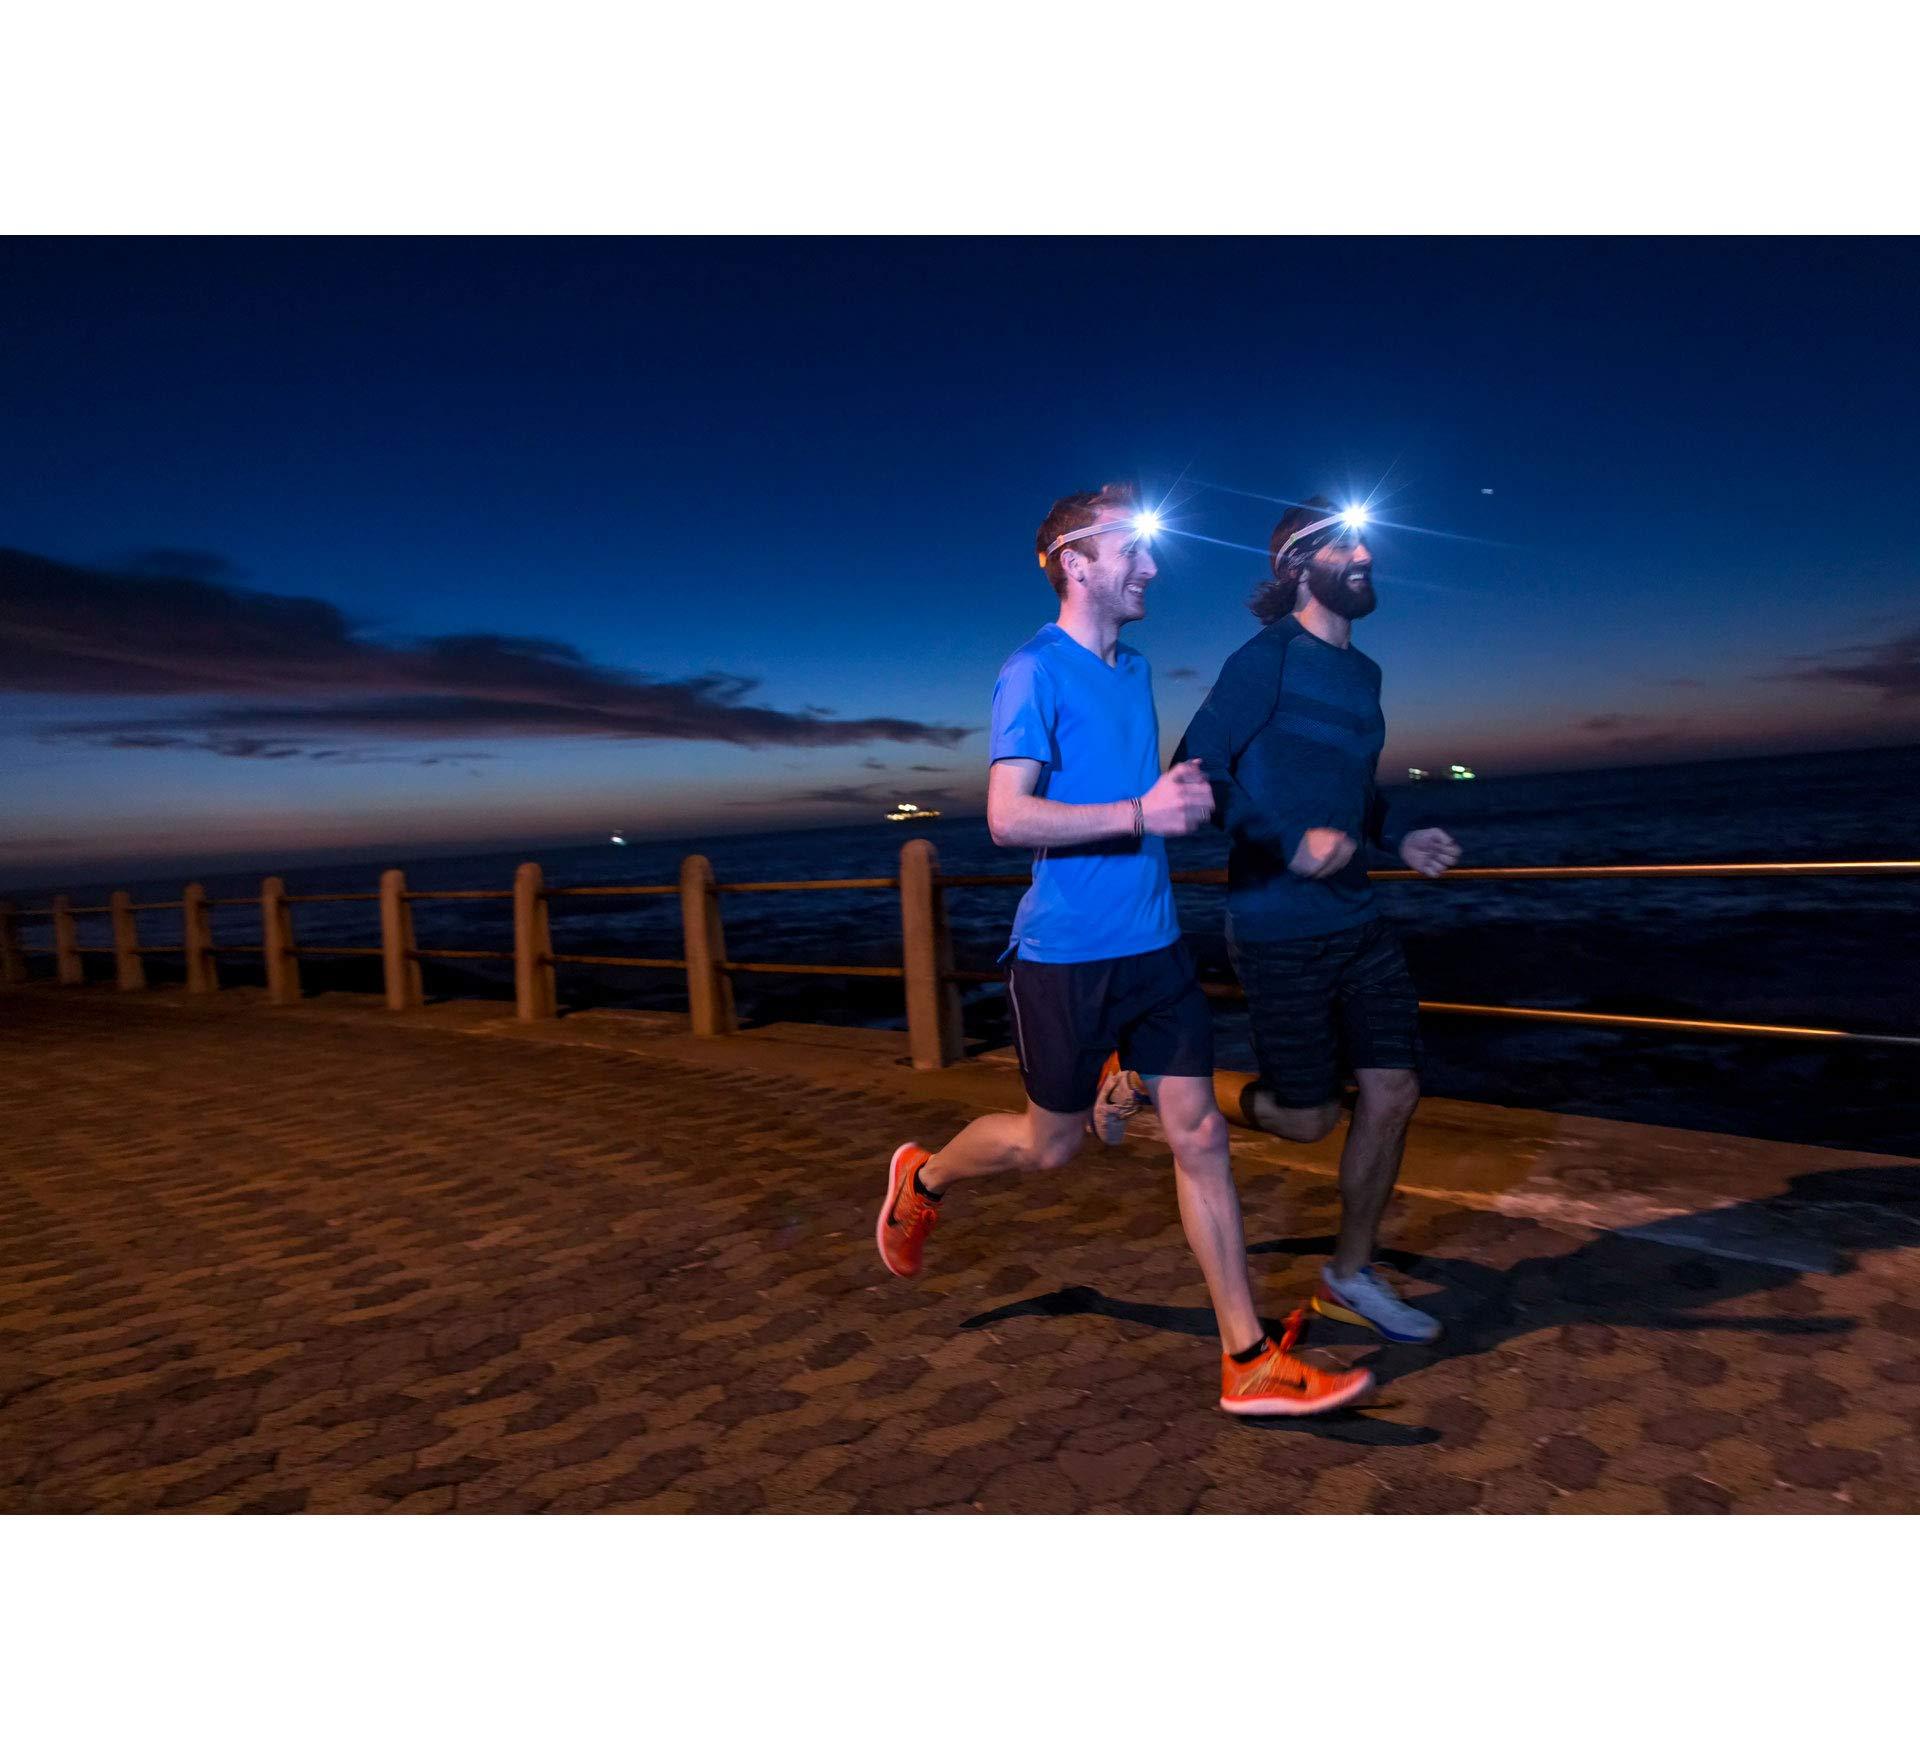 Led Lenser NEO 4 Jogging Headlamp